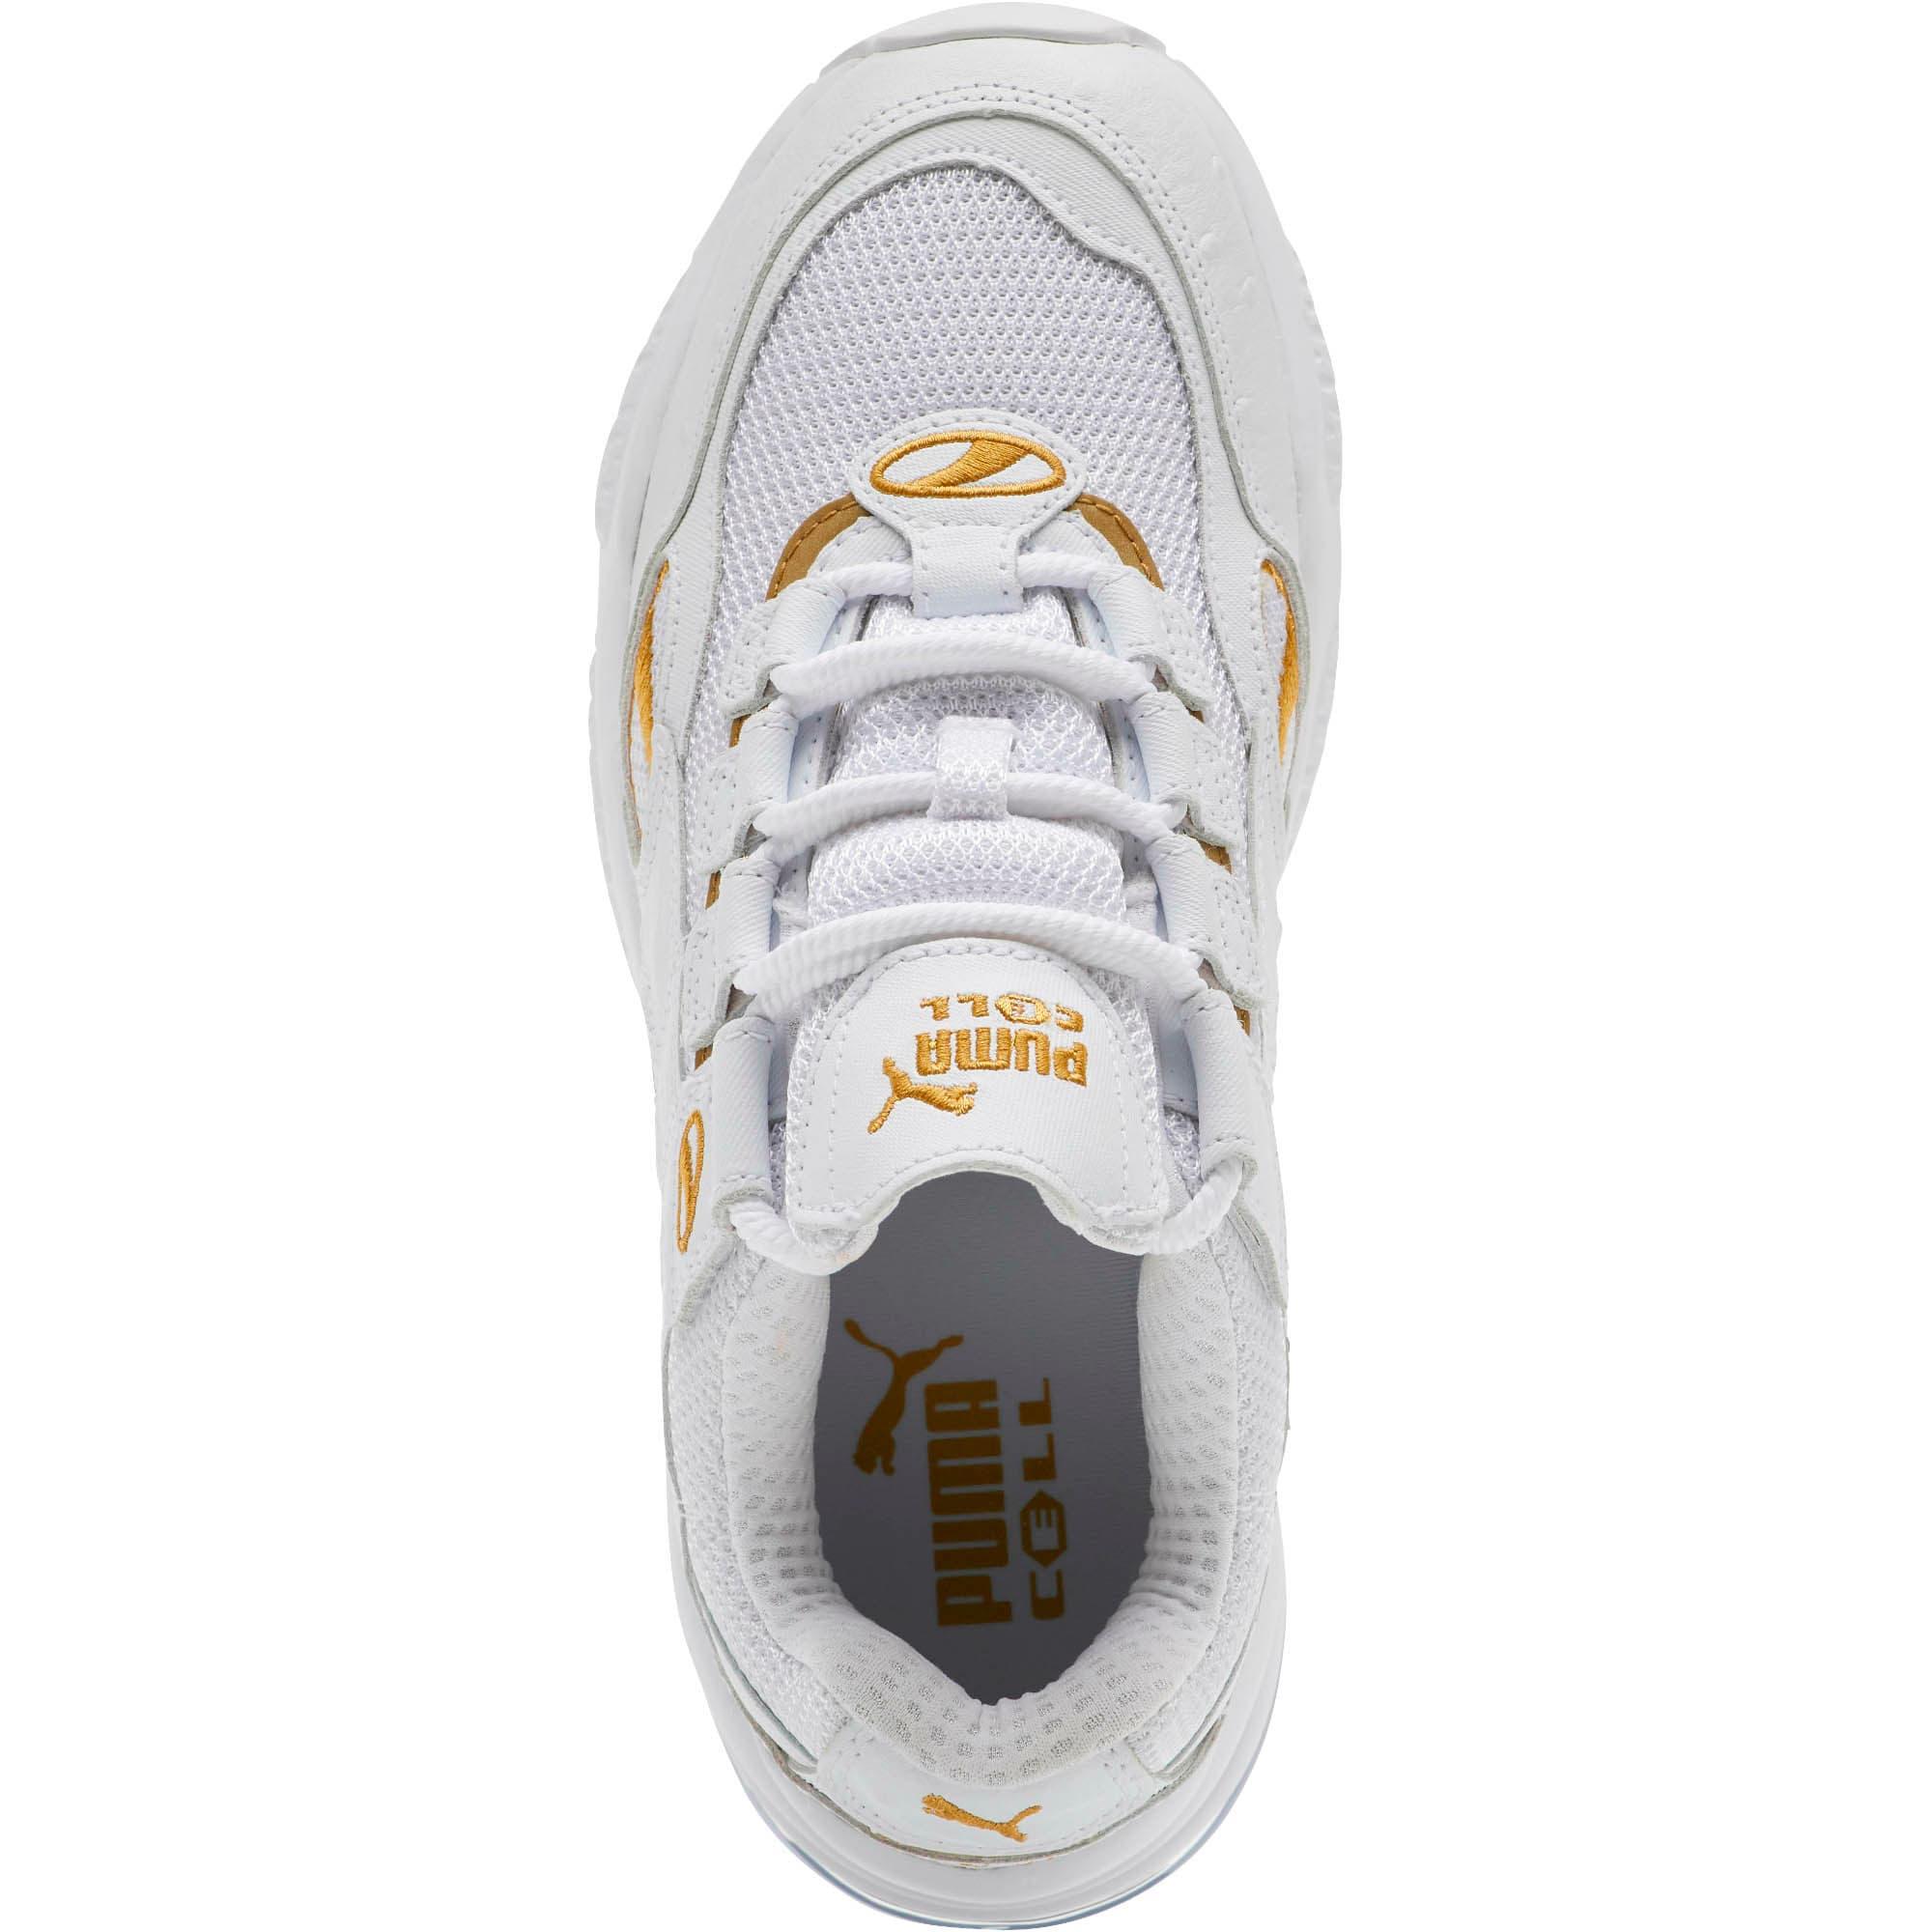 Thumbnail 5 of CELL Venom WO Women's Sneakers, Puma White-Puma Team Gold, medium